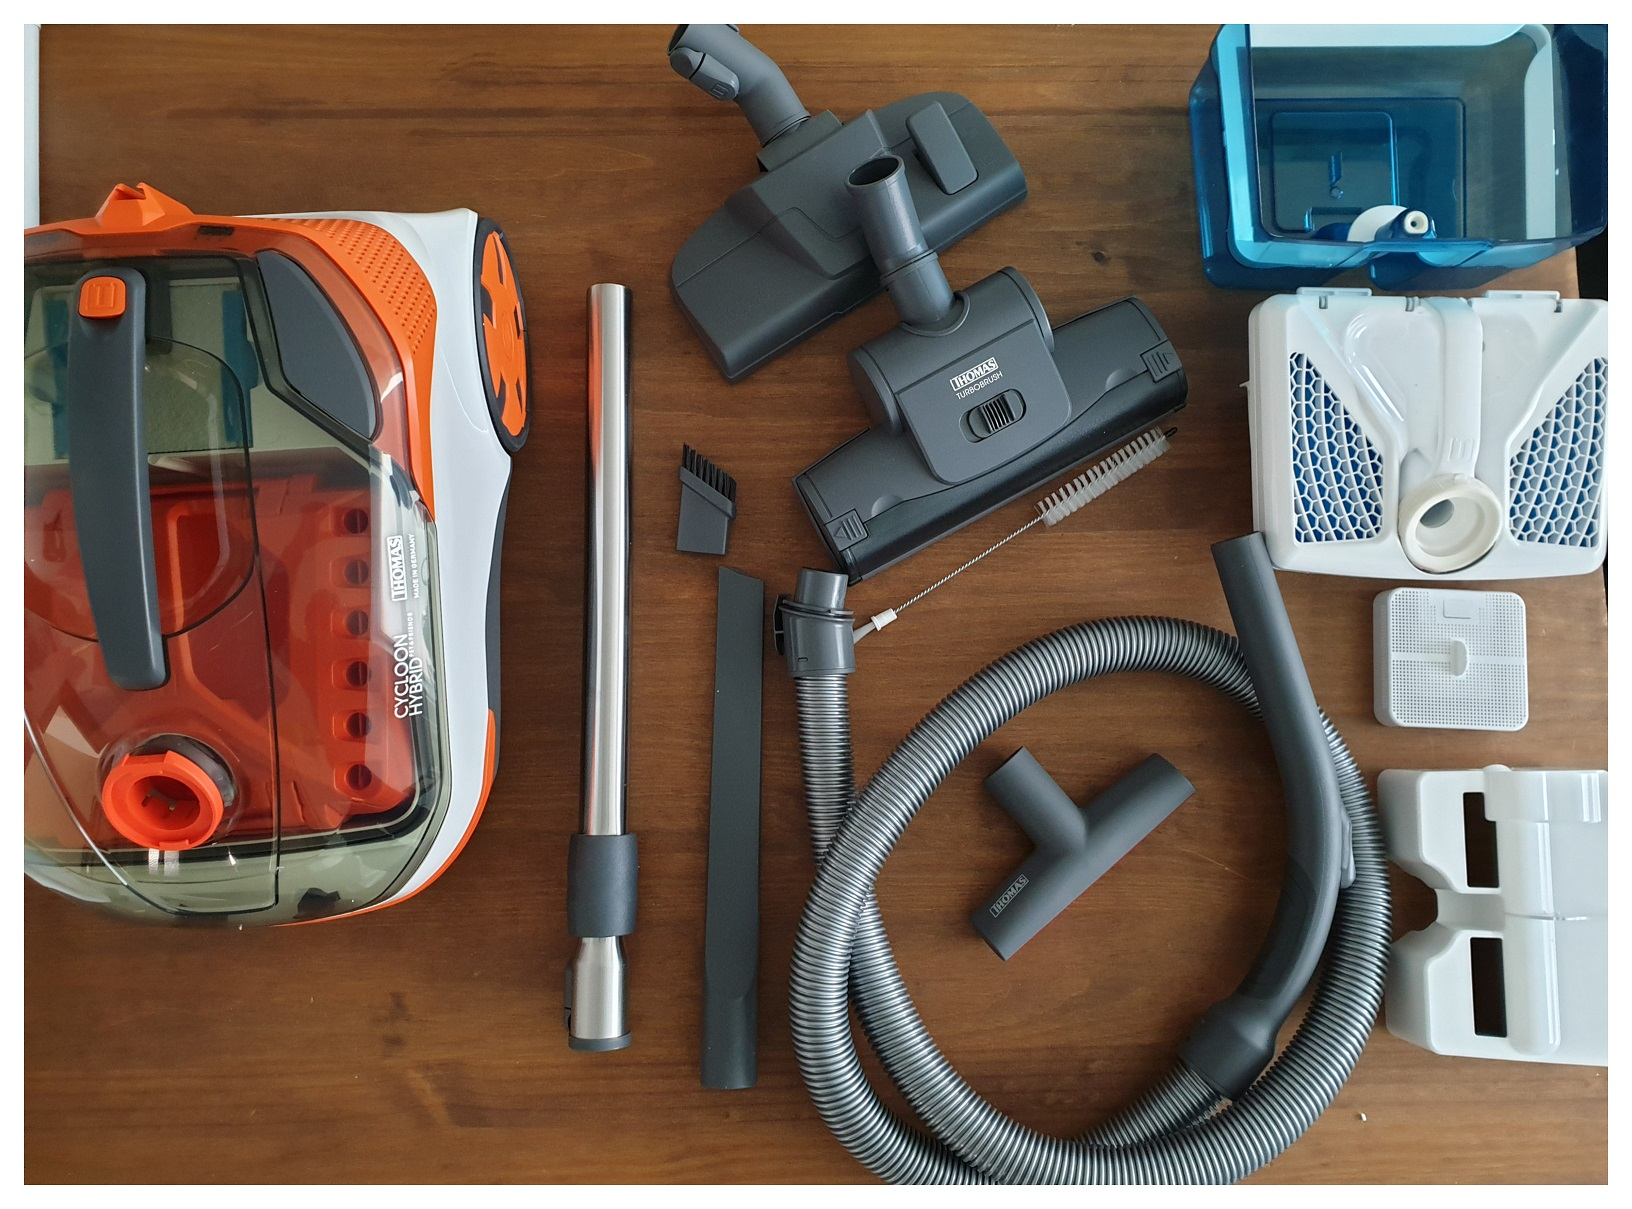 Compleet accessoirepakket van de Cycloon Hybrid Pt & Friends van Thoma